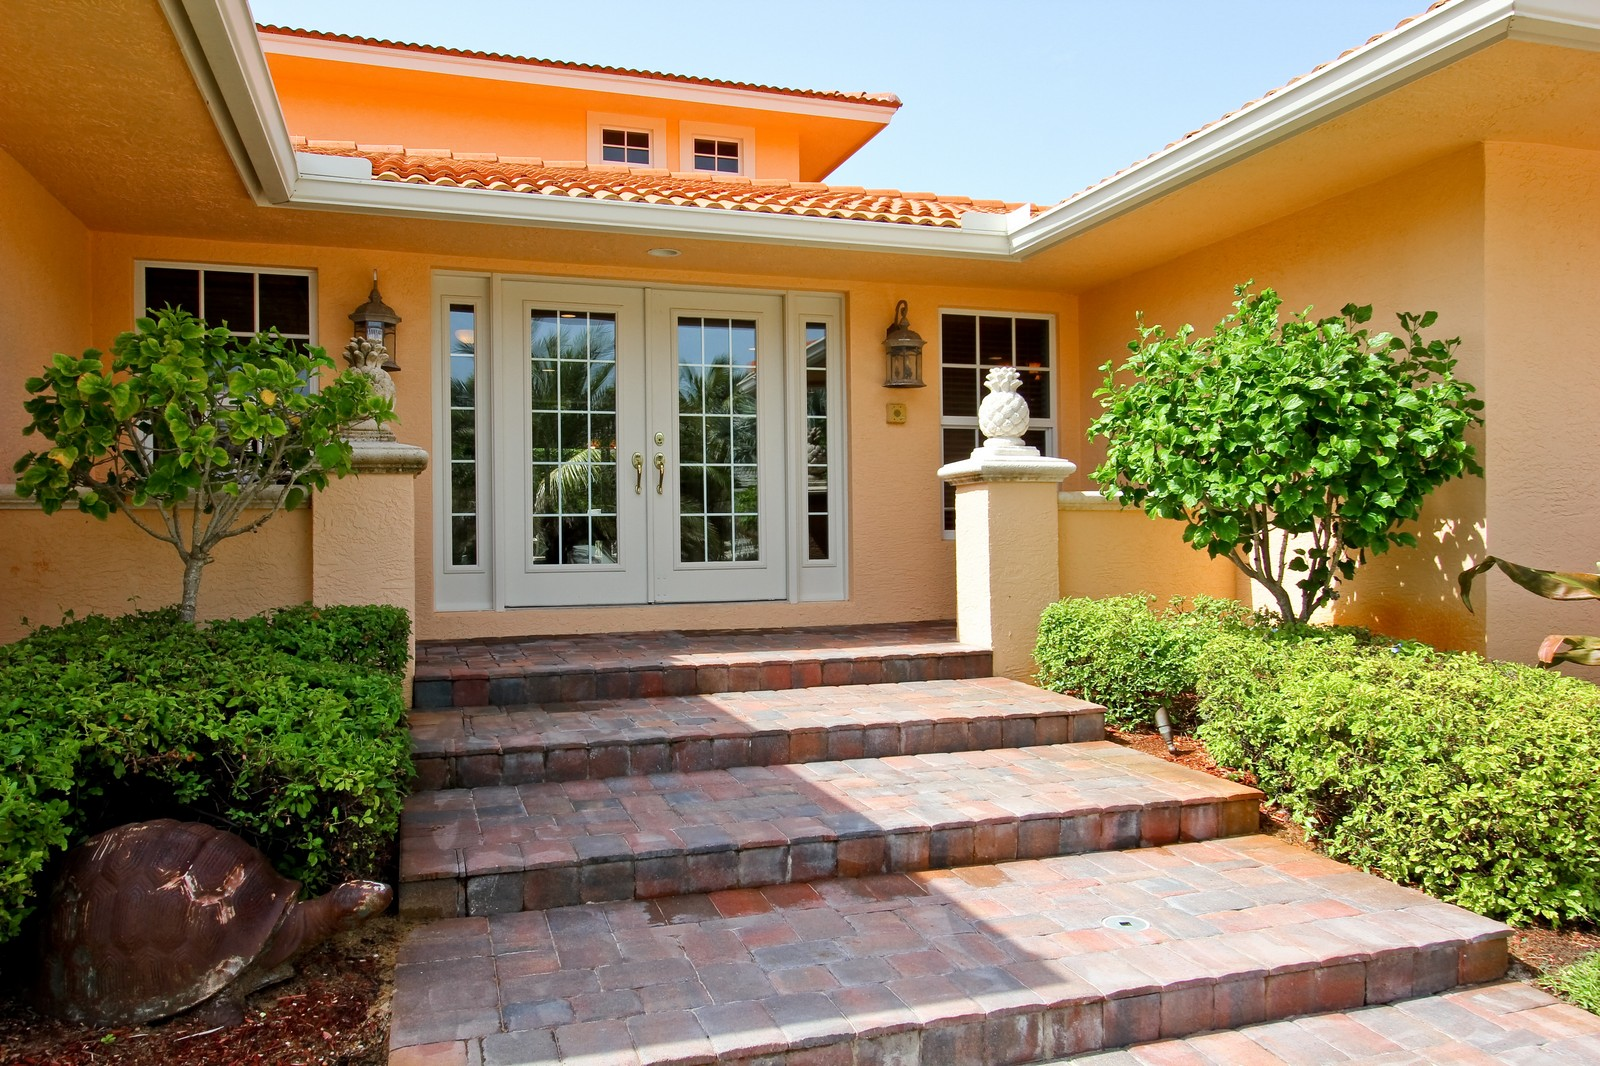 Real Estate Photography - 430 N. Lyra Circle, Juno Beach, FL, 33408 - Entryway